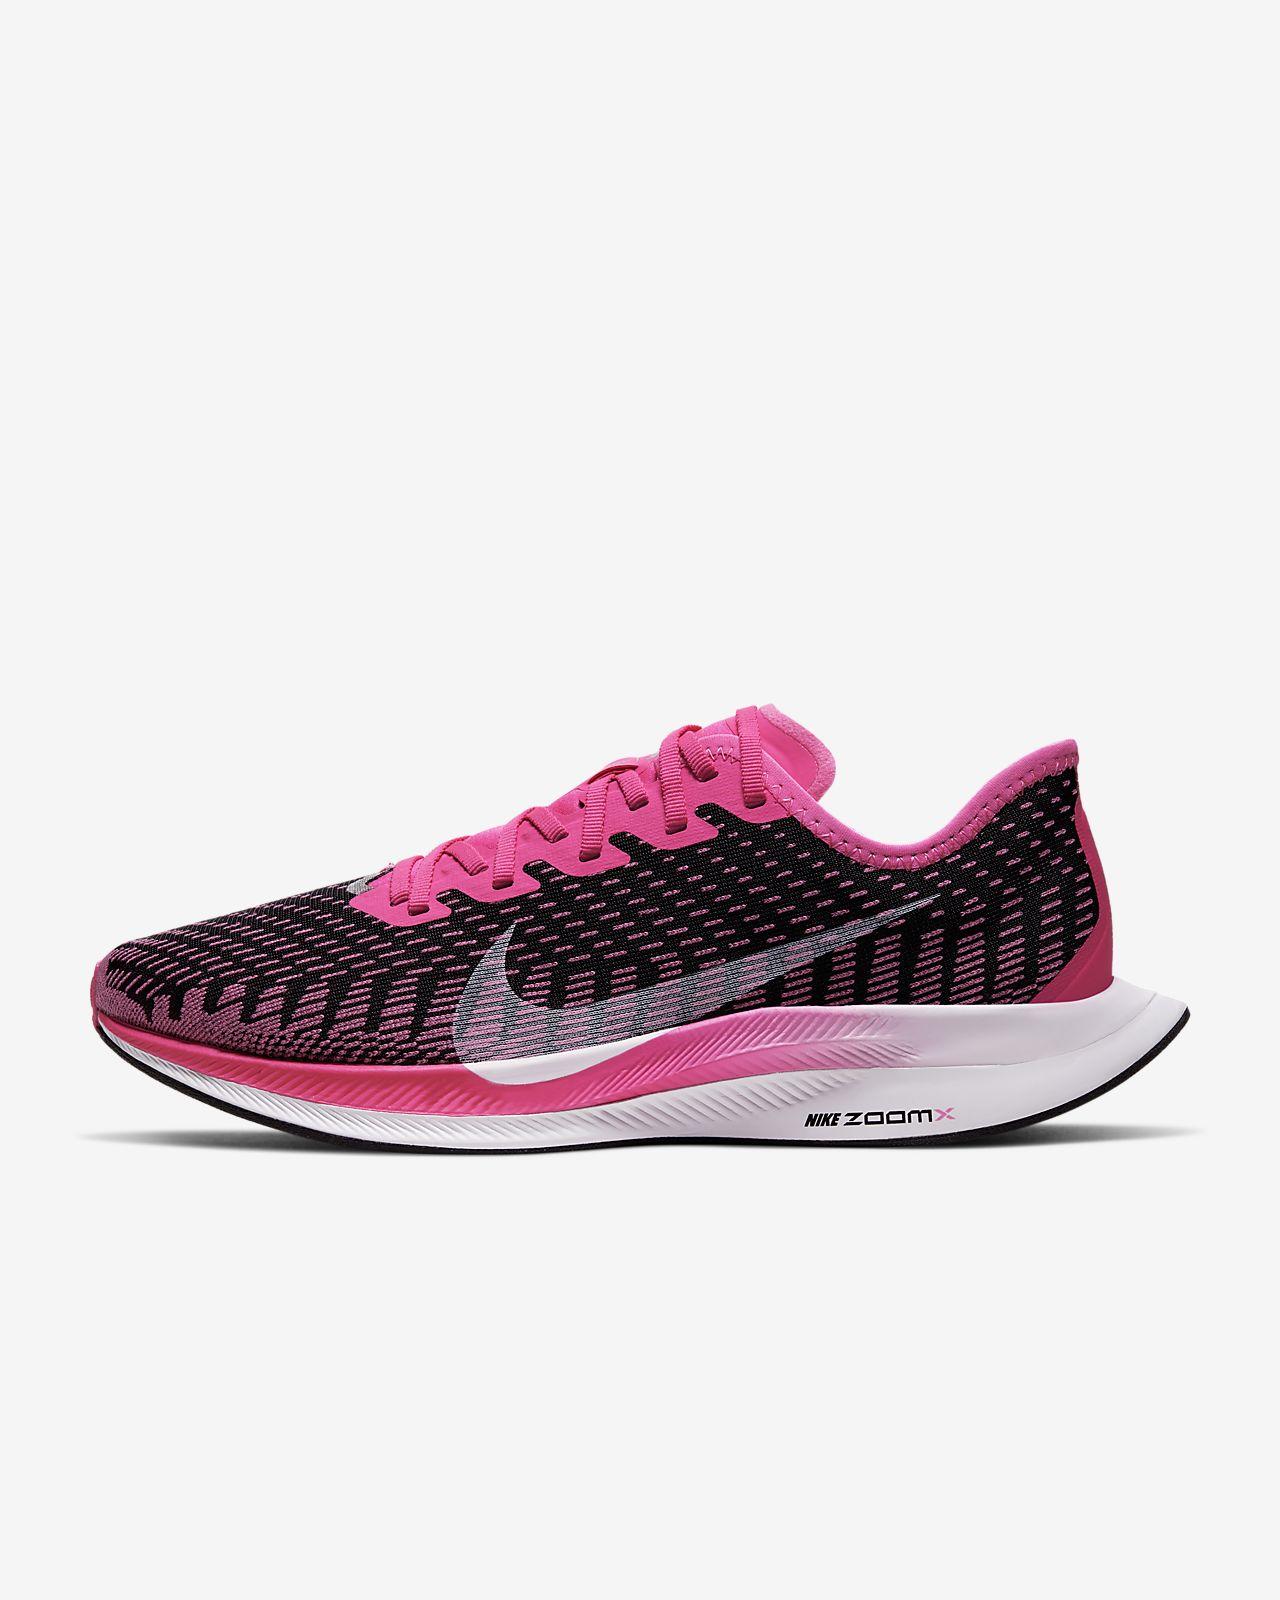 pick up affordable price beauty Nike Zoom Pegasus Turbo 2 Women's Running Shoe